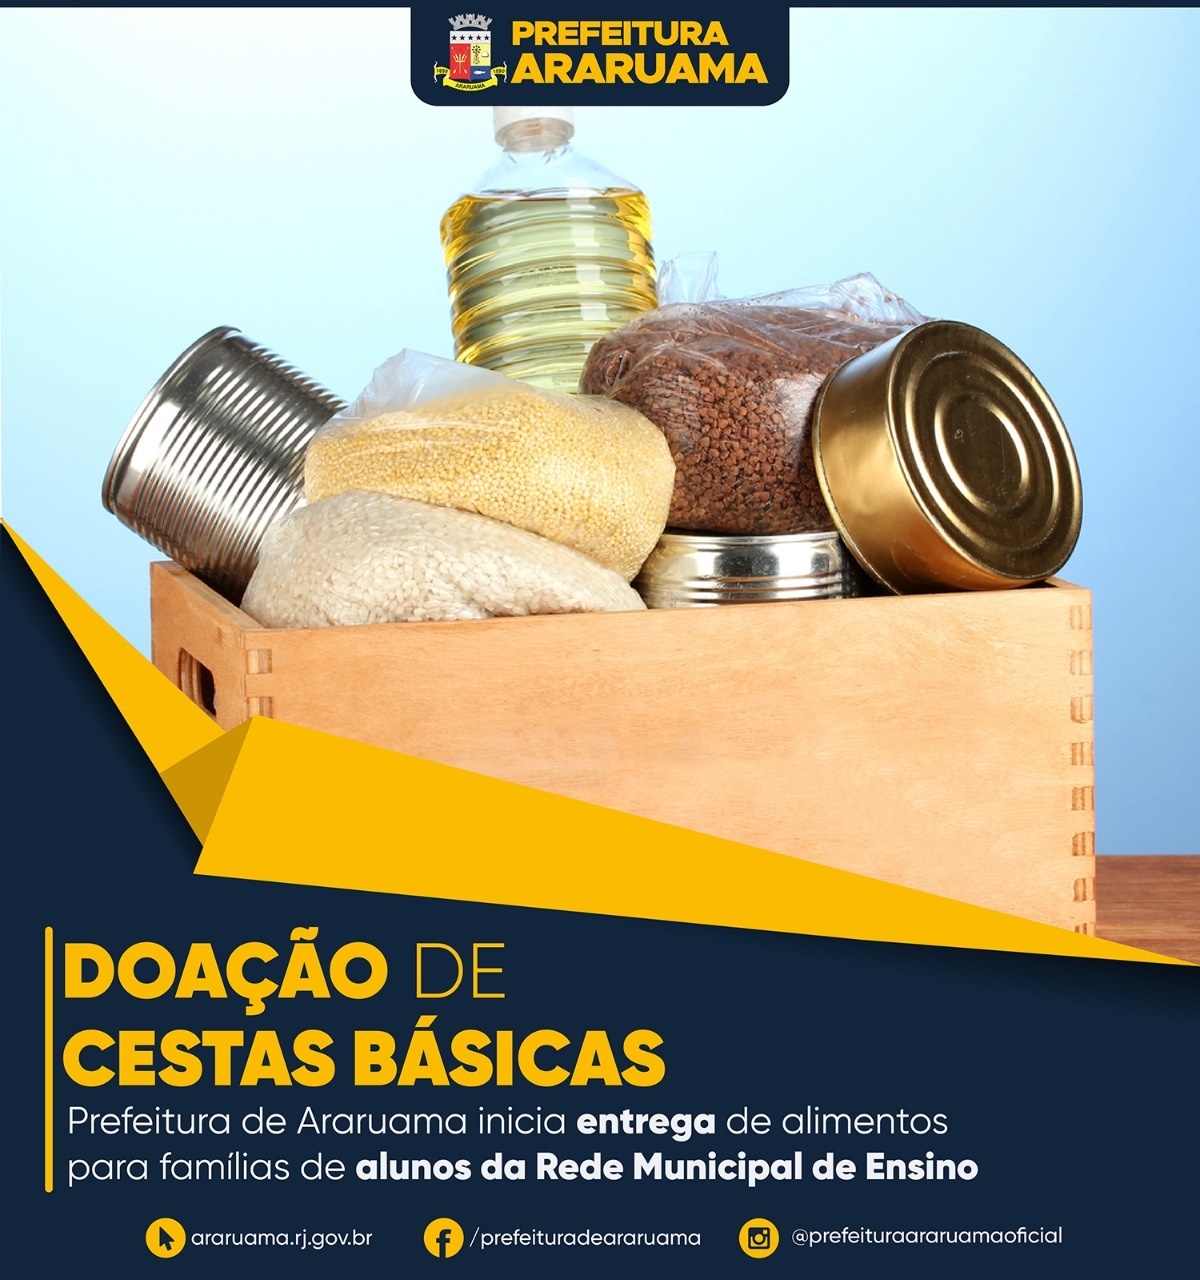 Prefeitura de Araruama inicia na sexta-feira, 10, entrega de cestas básicas para famílias de alunos da rede municipal de ensino